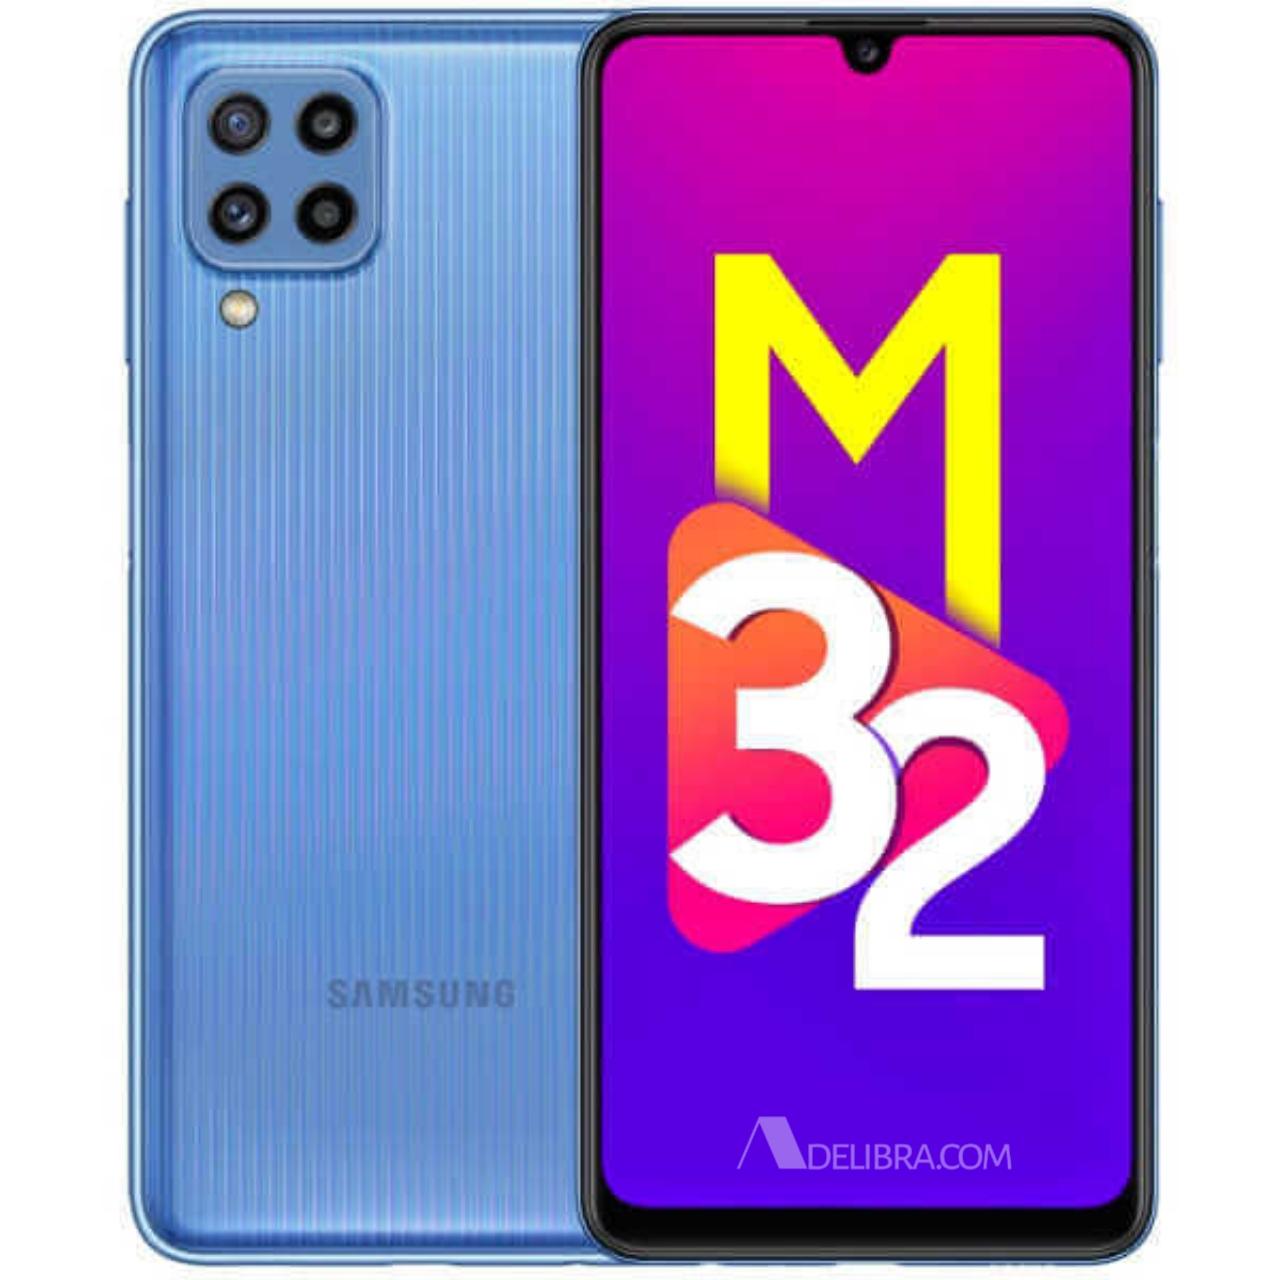 Samsung Galaxy M32 FAQs